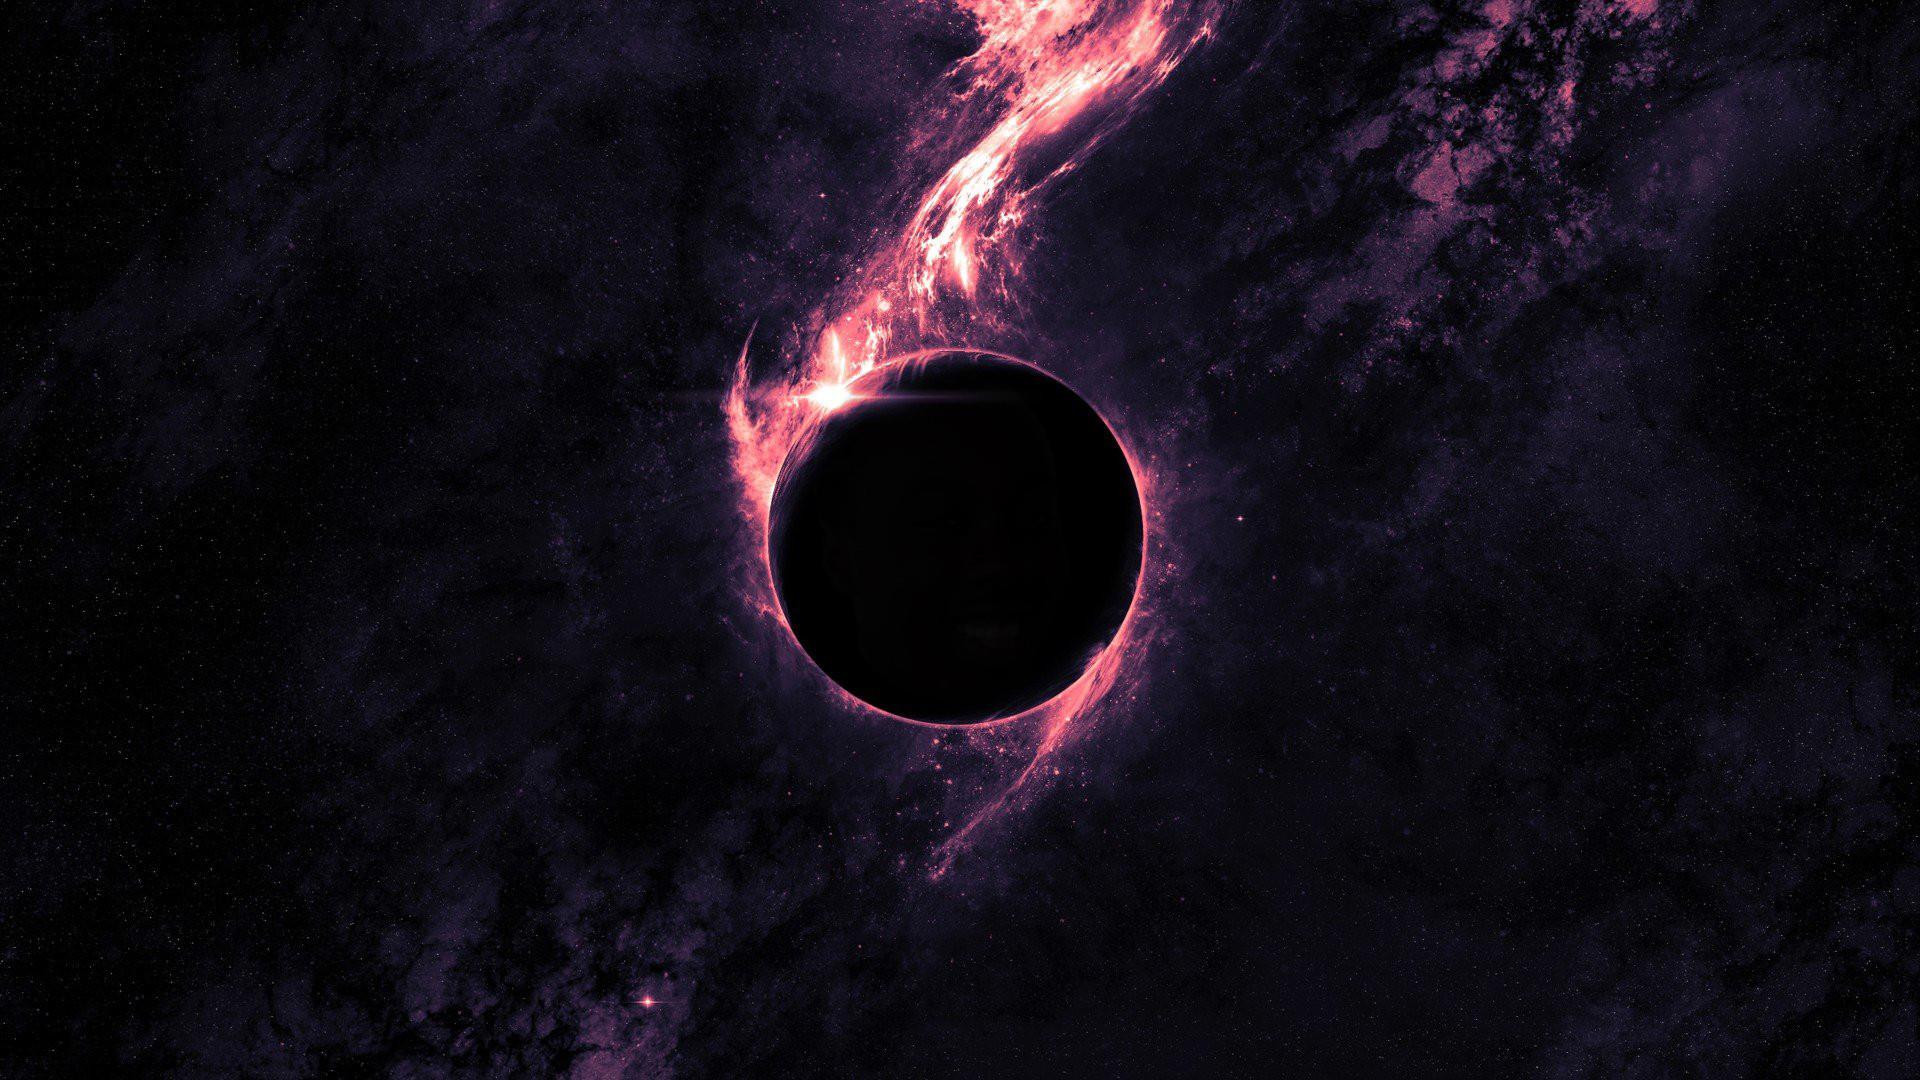 picsart素材黑洞